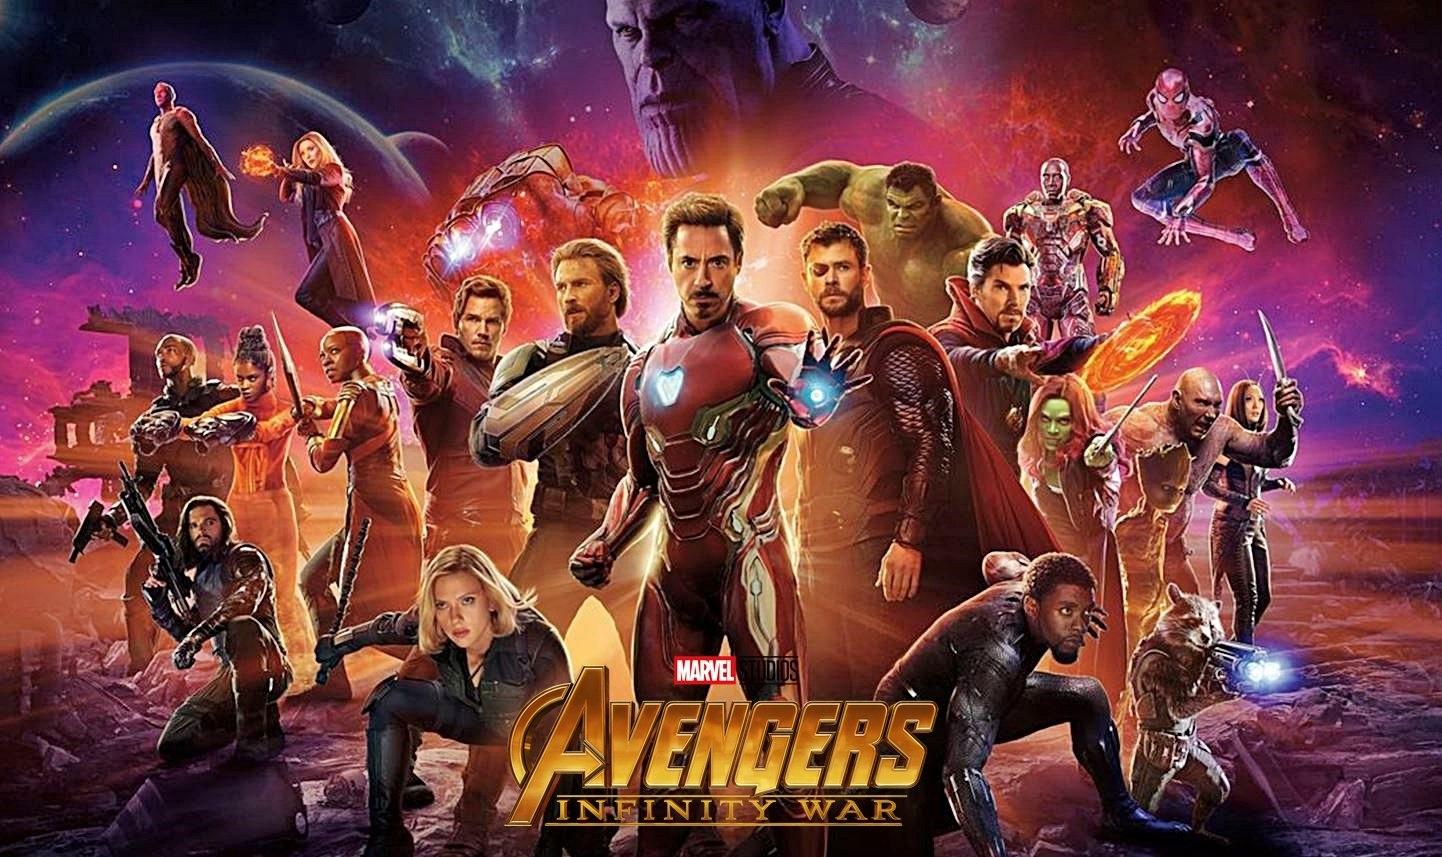 Avengers: Endgame; screenshot: Infinity War